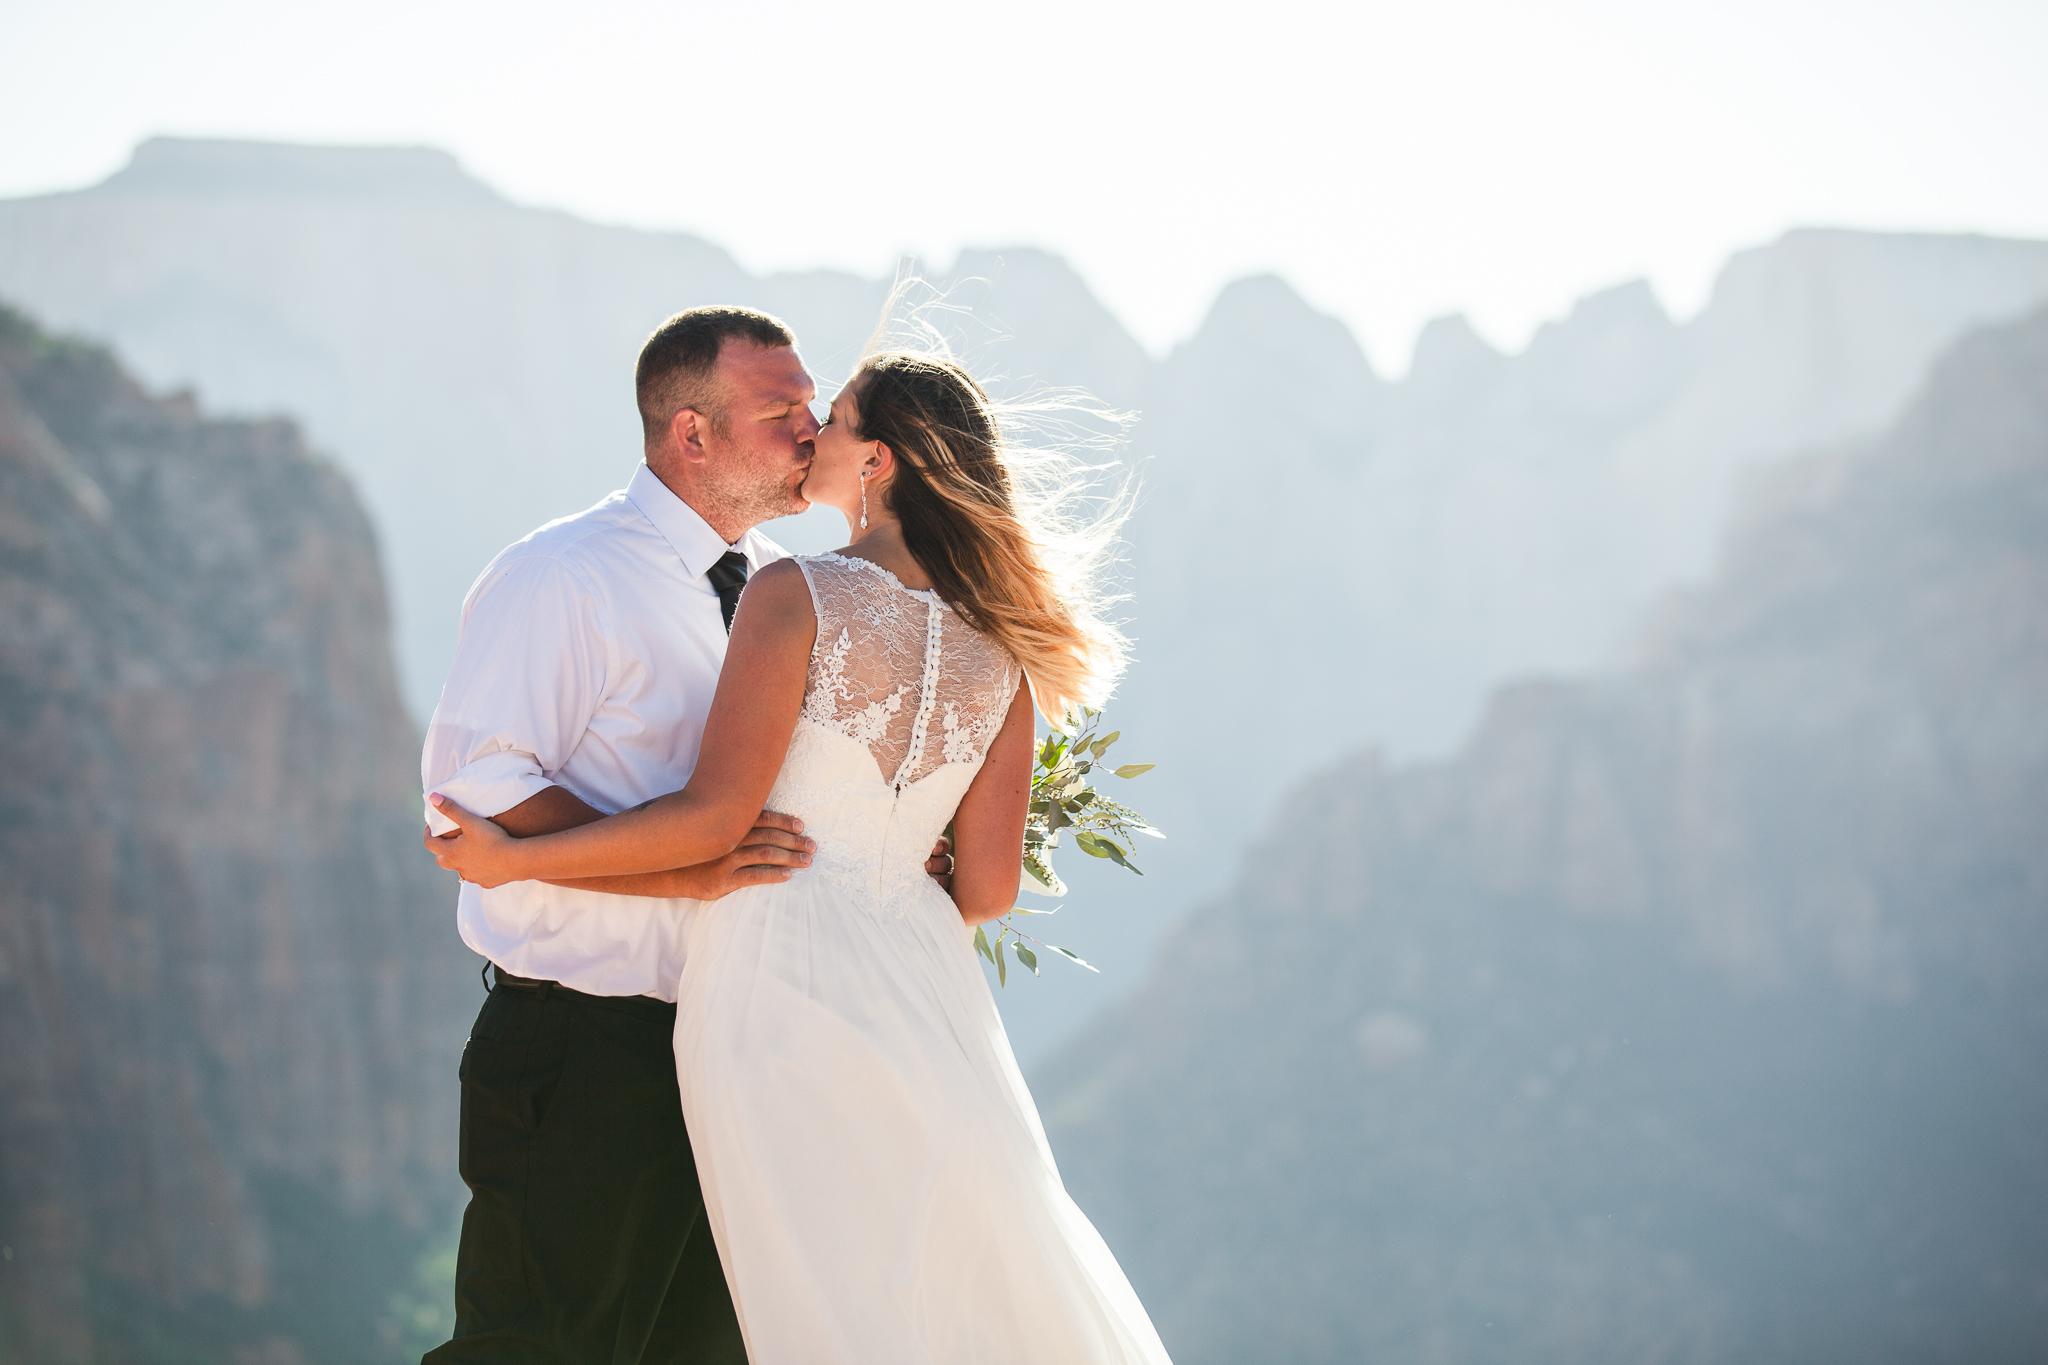 Zion National Park Elopement - Danielle Salerno Photography - Dana and Jason - Adventure Photography , Elopement Photographer